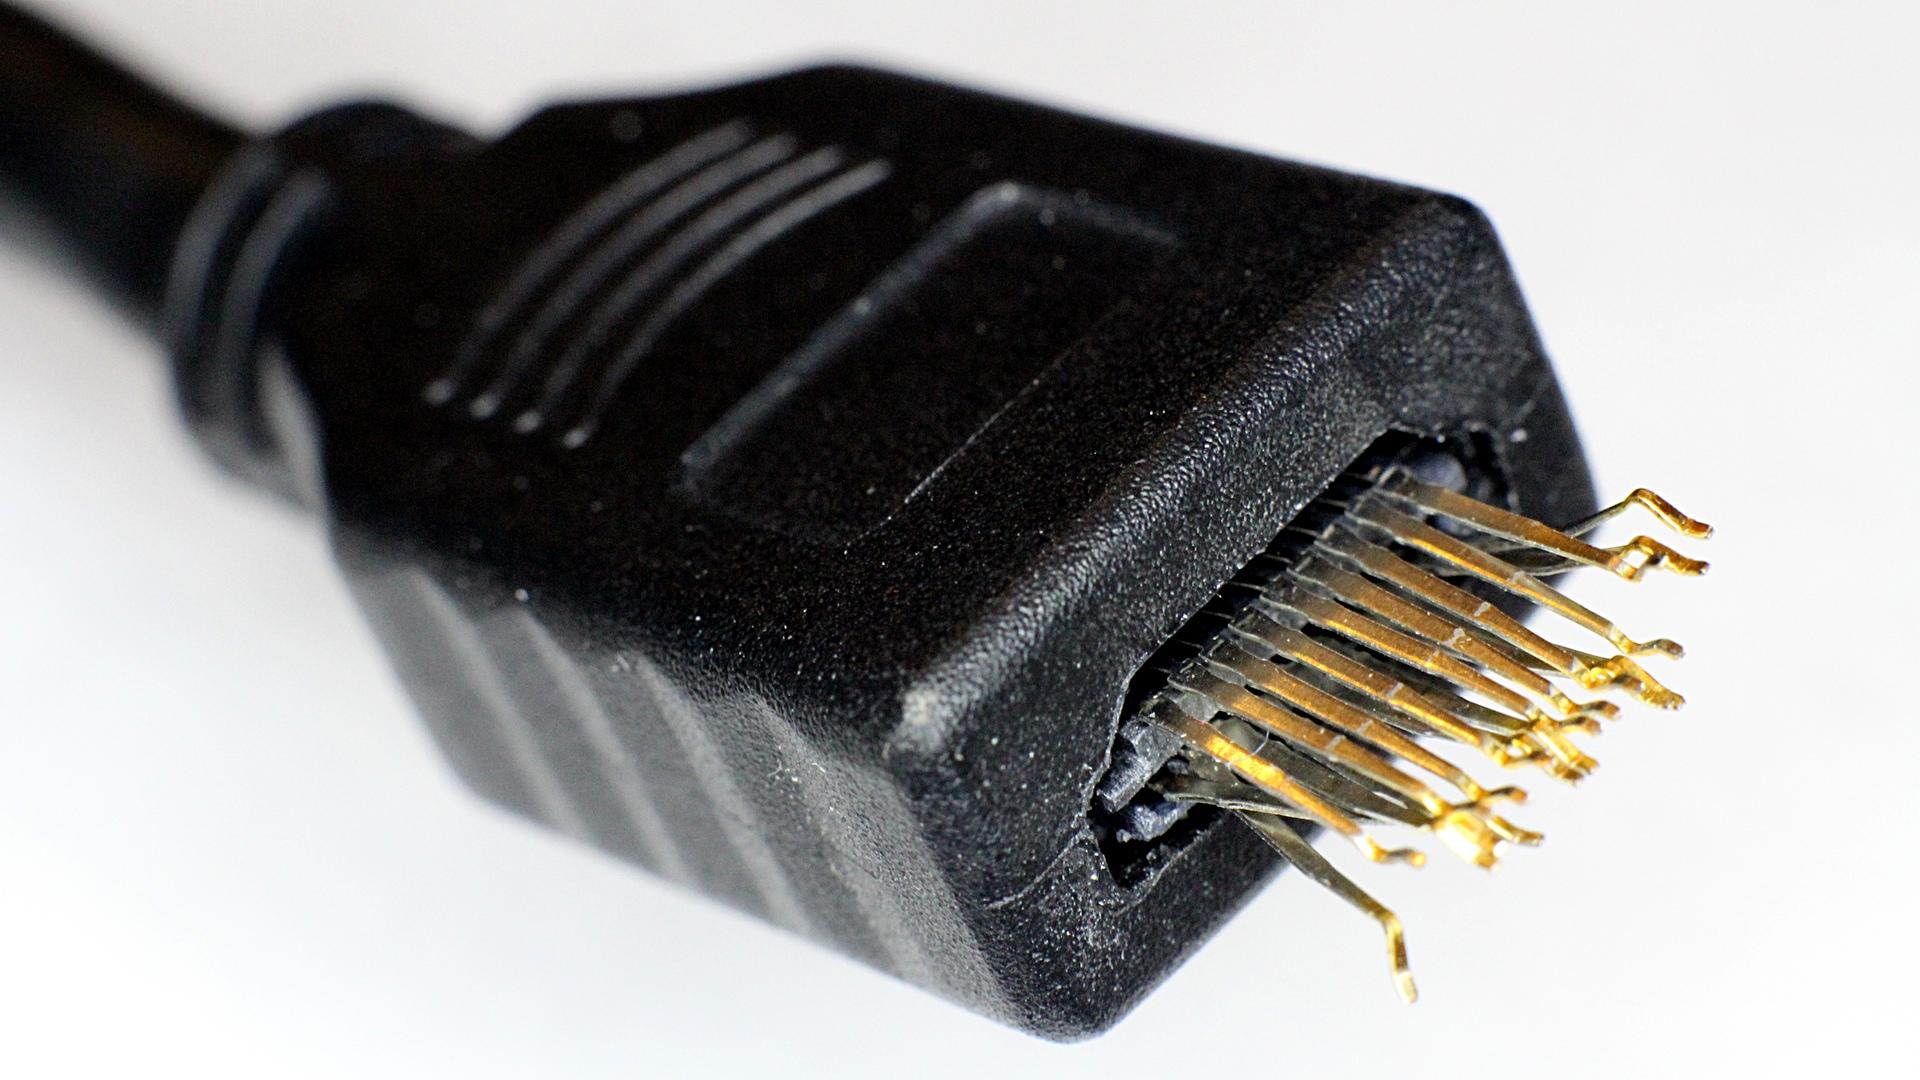 Broken HDMI Cable pPkug